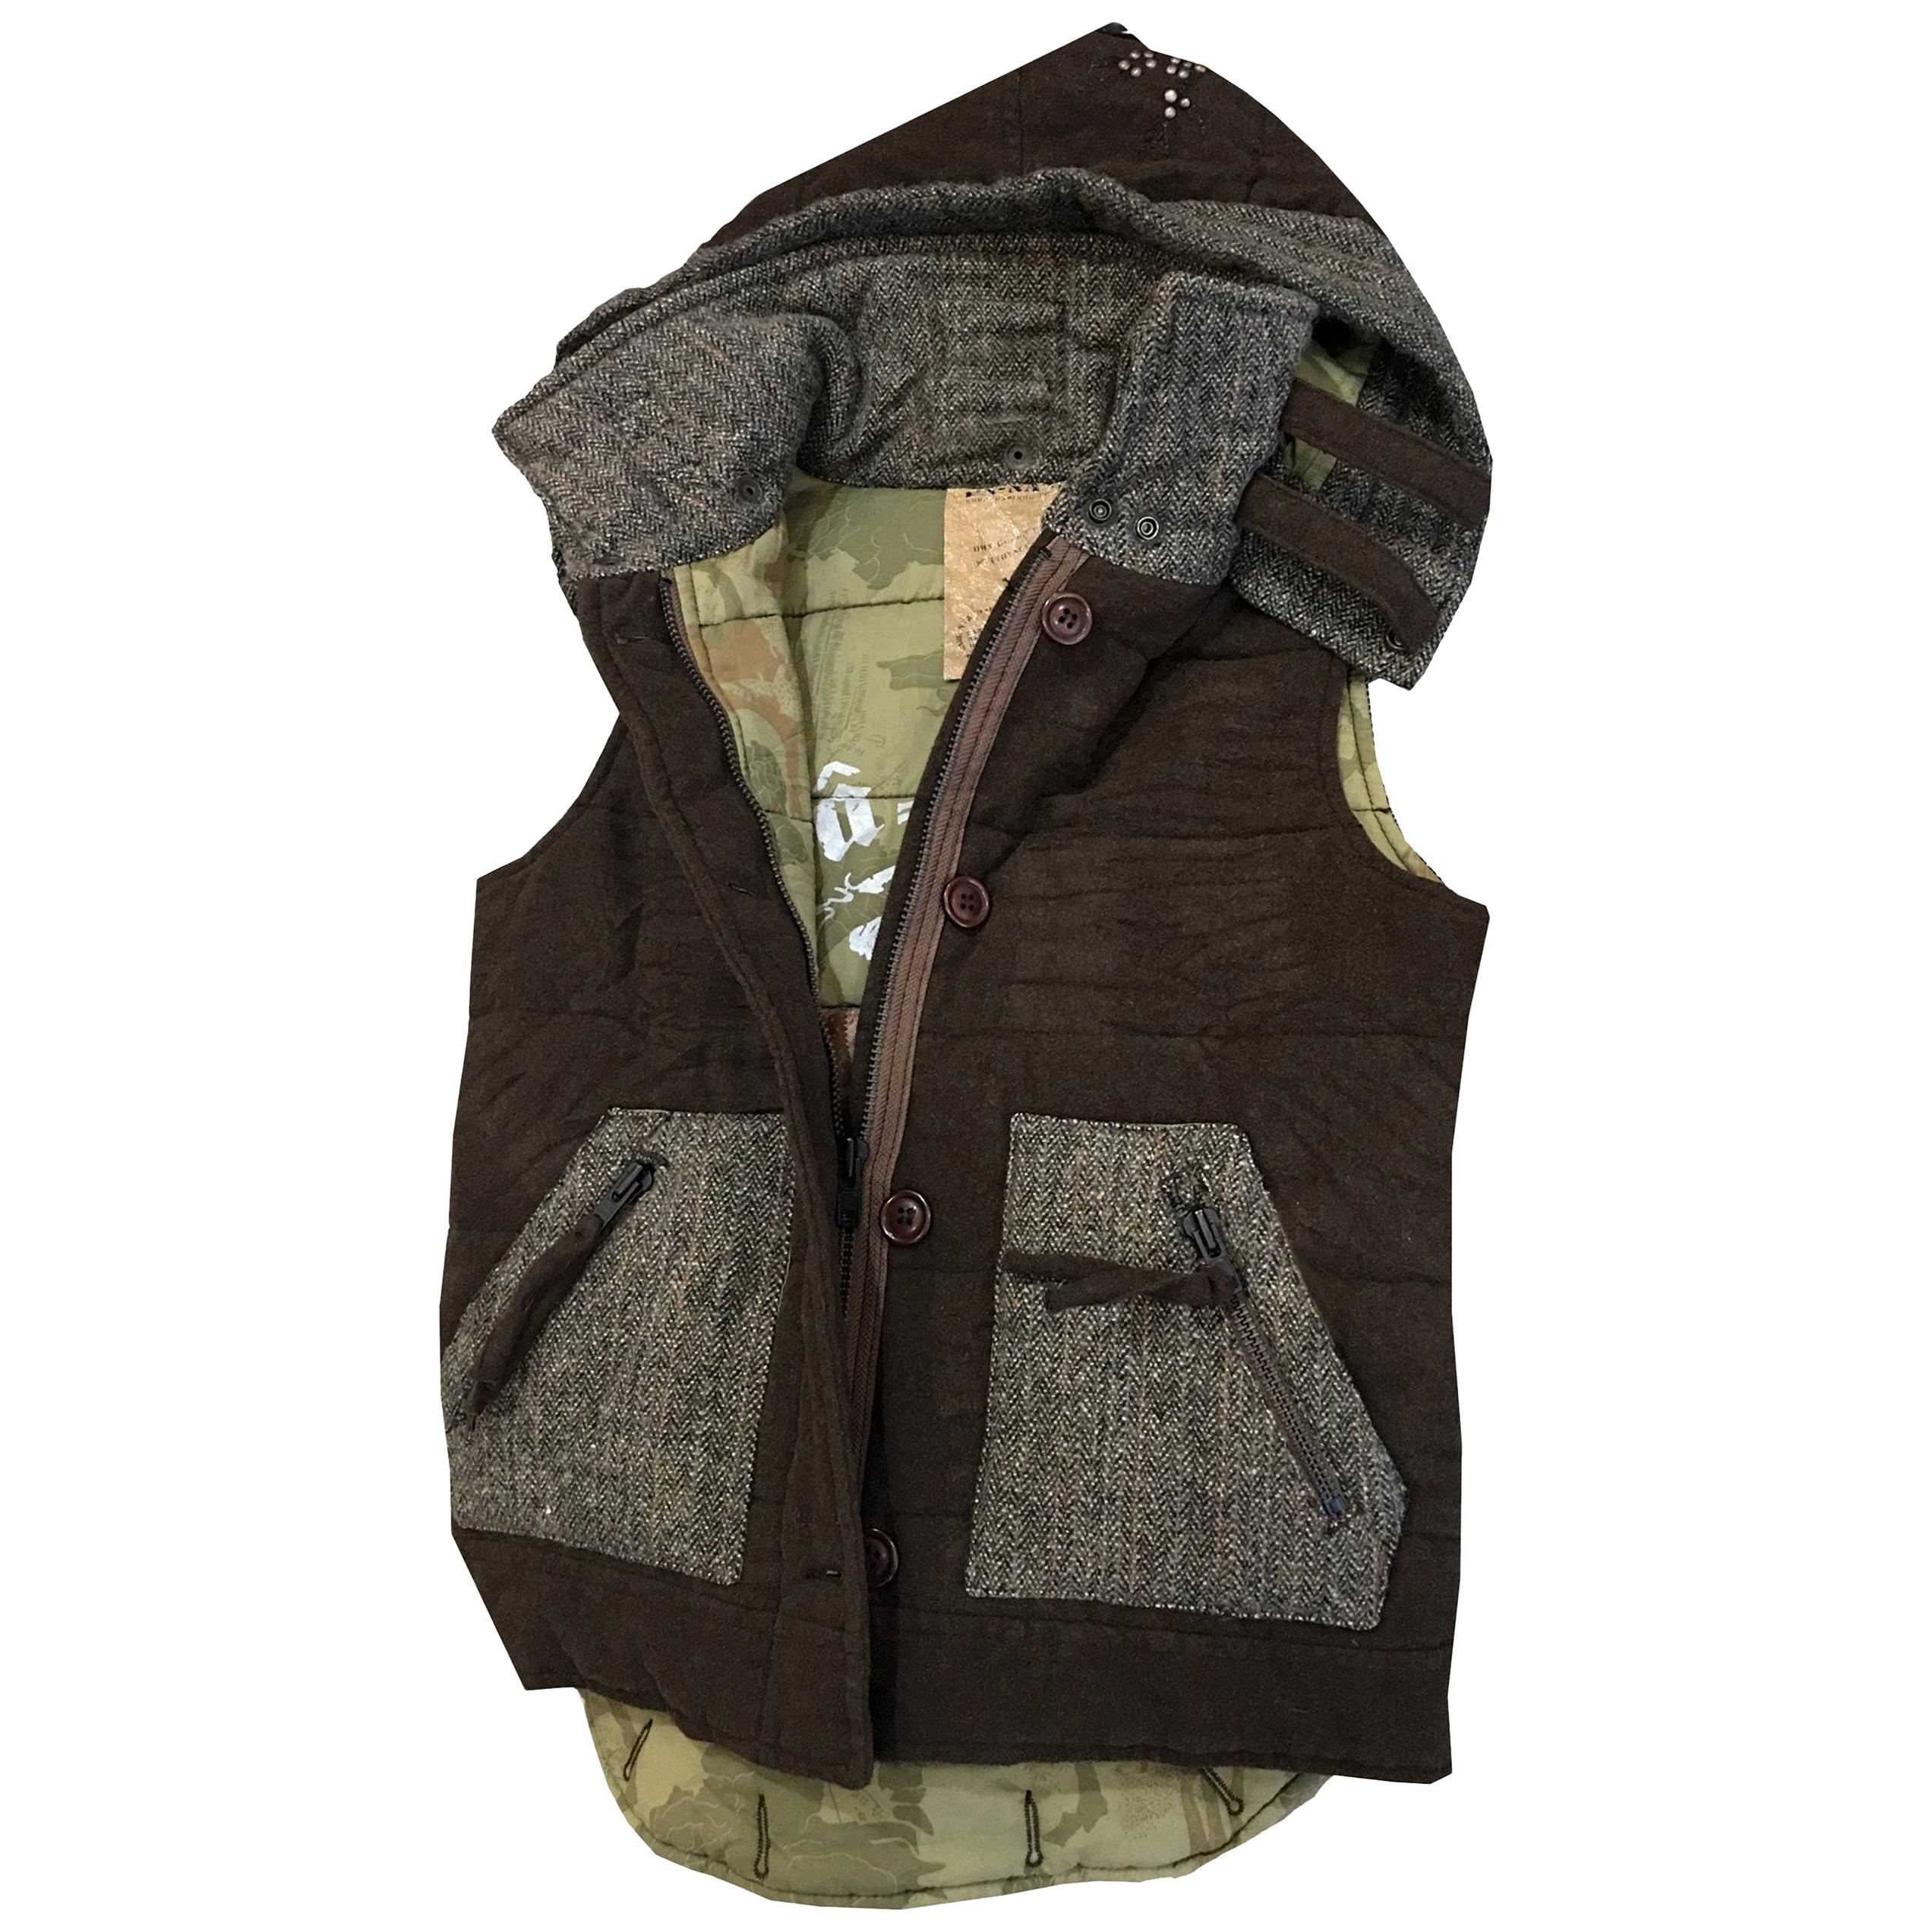 New Da-Nang Knit Wool Vest With Detachable Hood Sz M